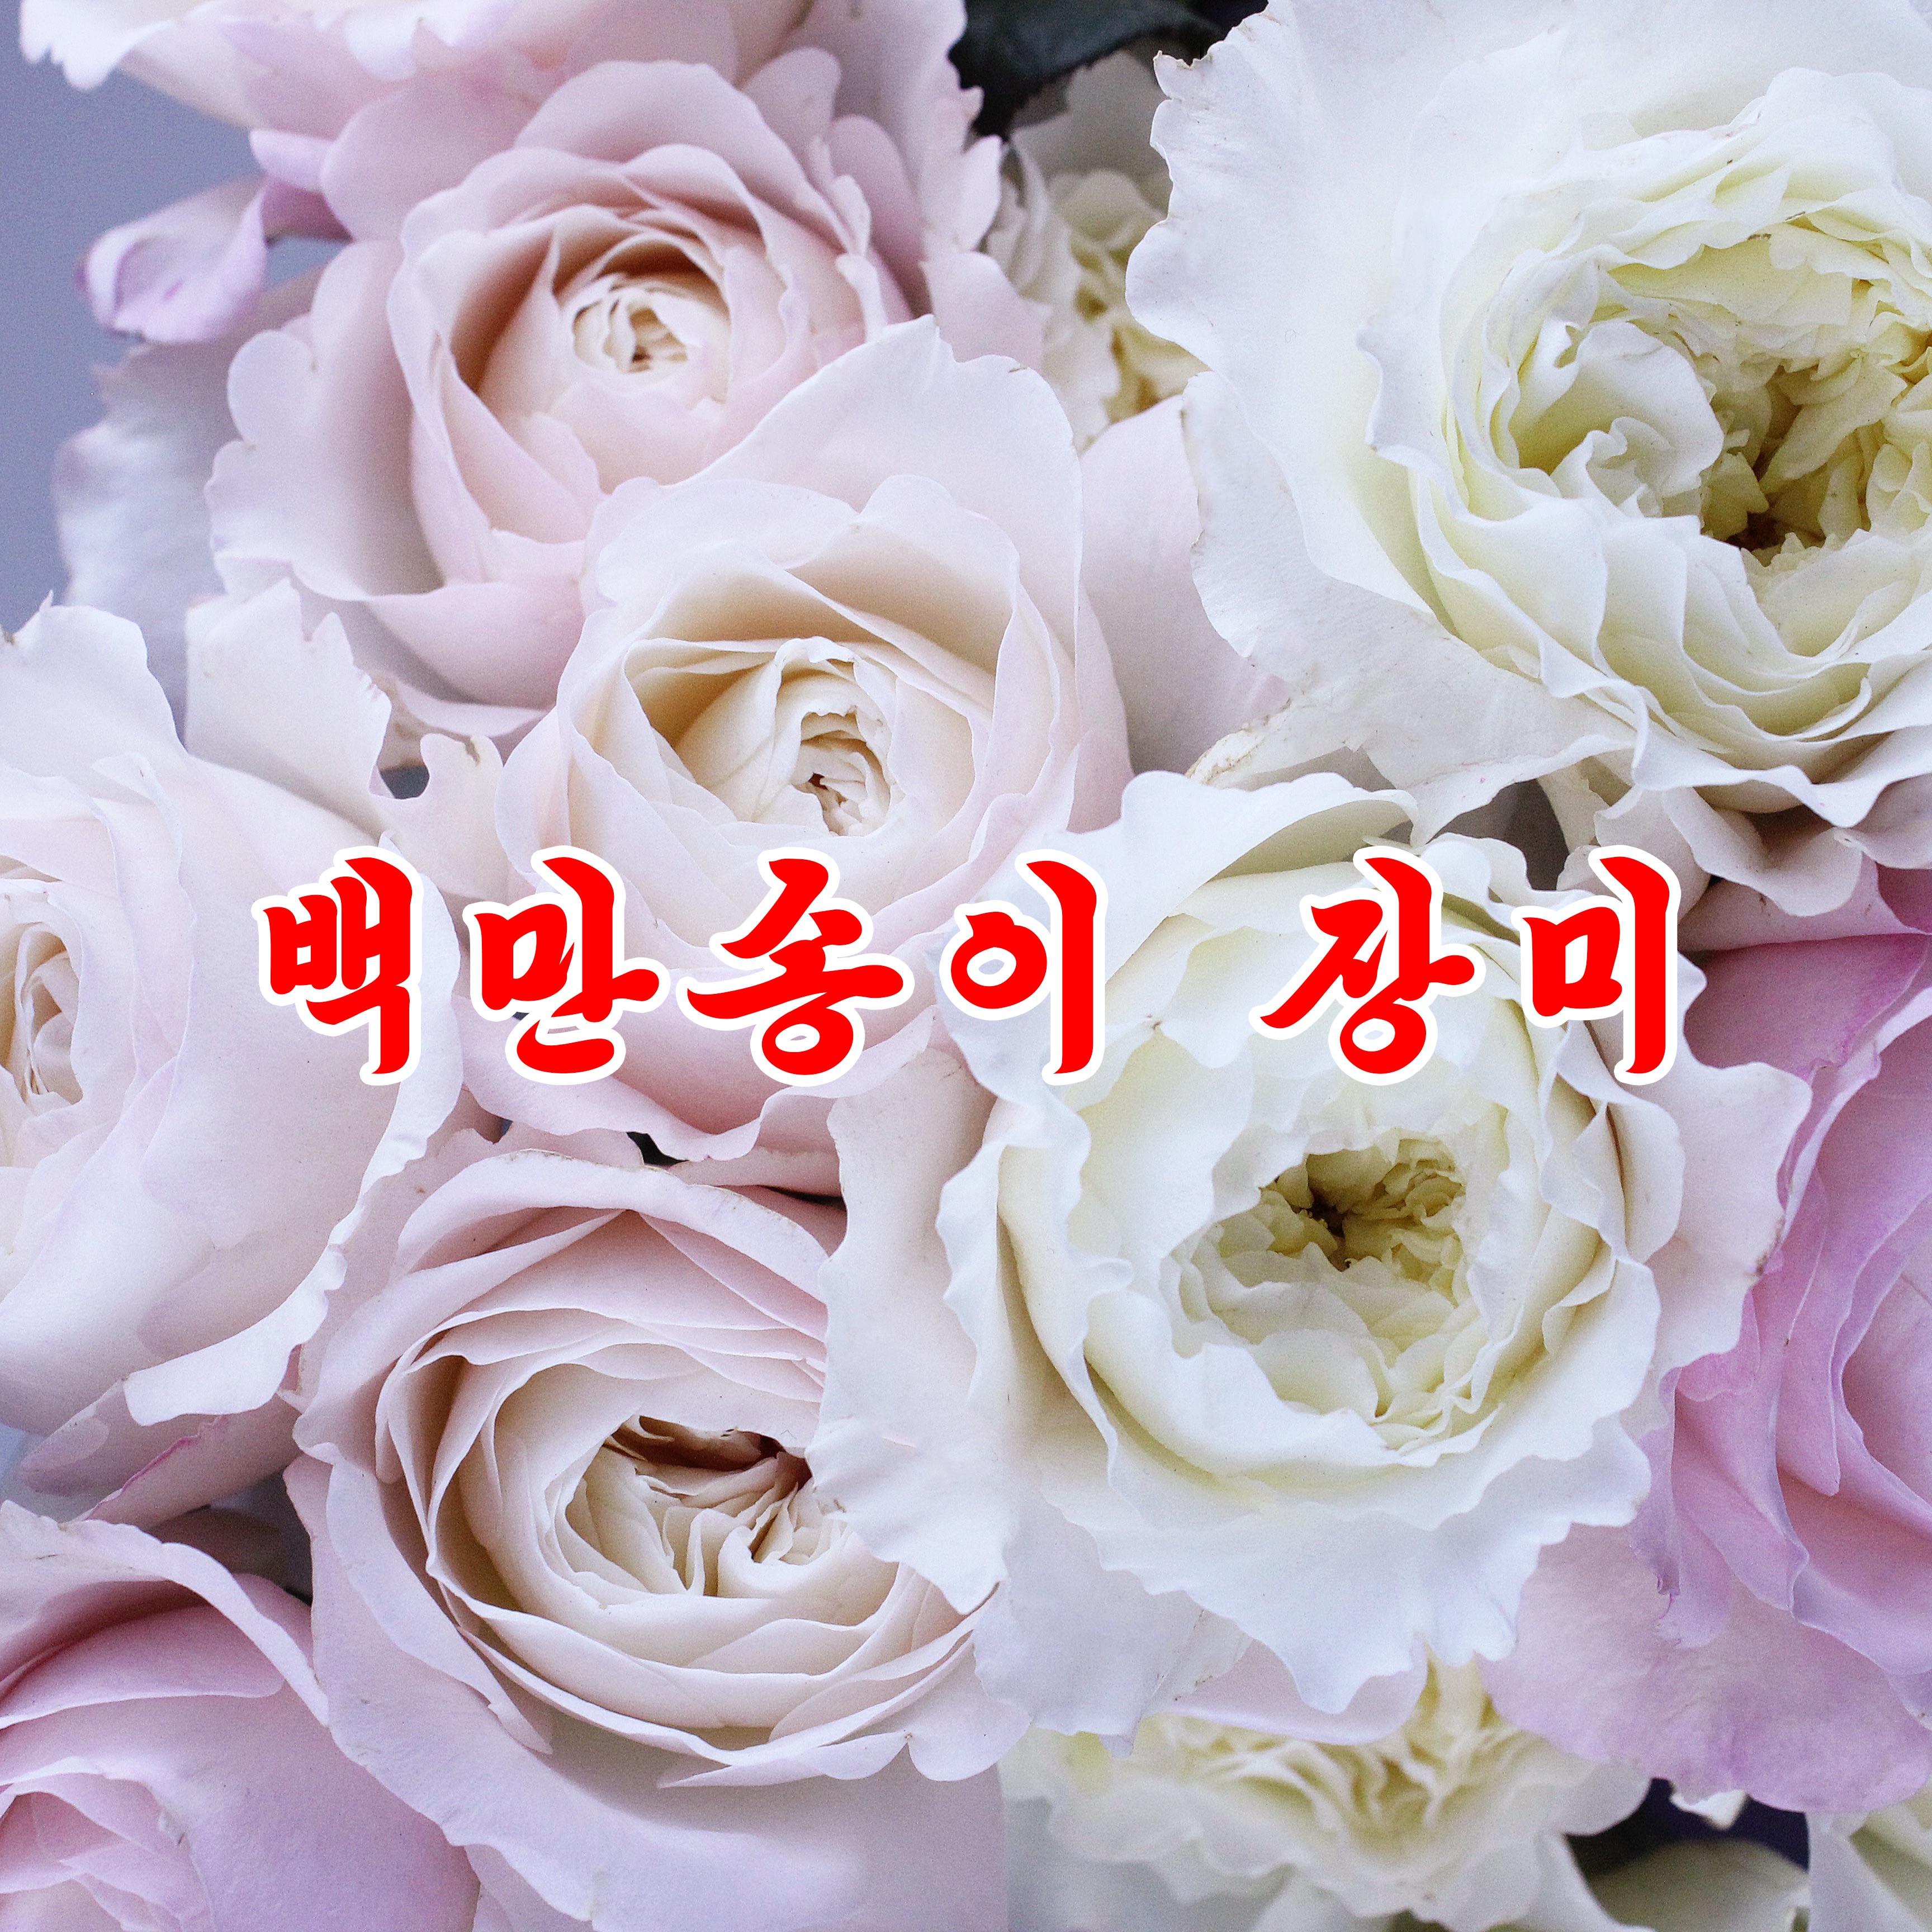 Million Roses «백만송이 장미 / Миллион роз» - cover